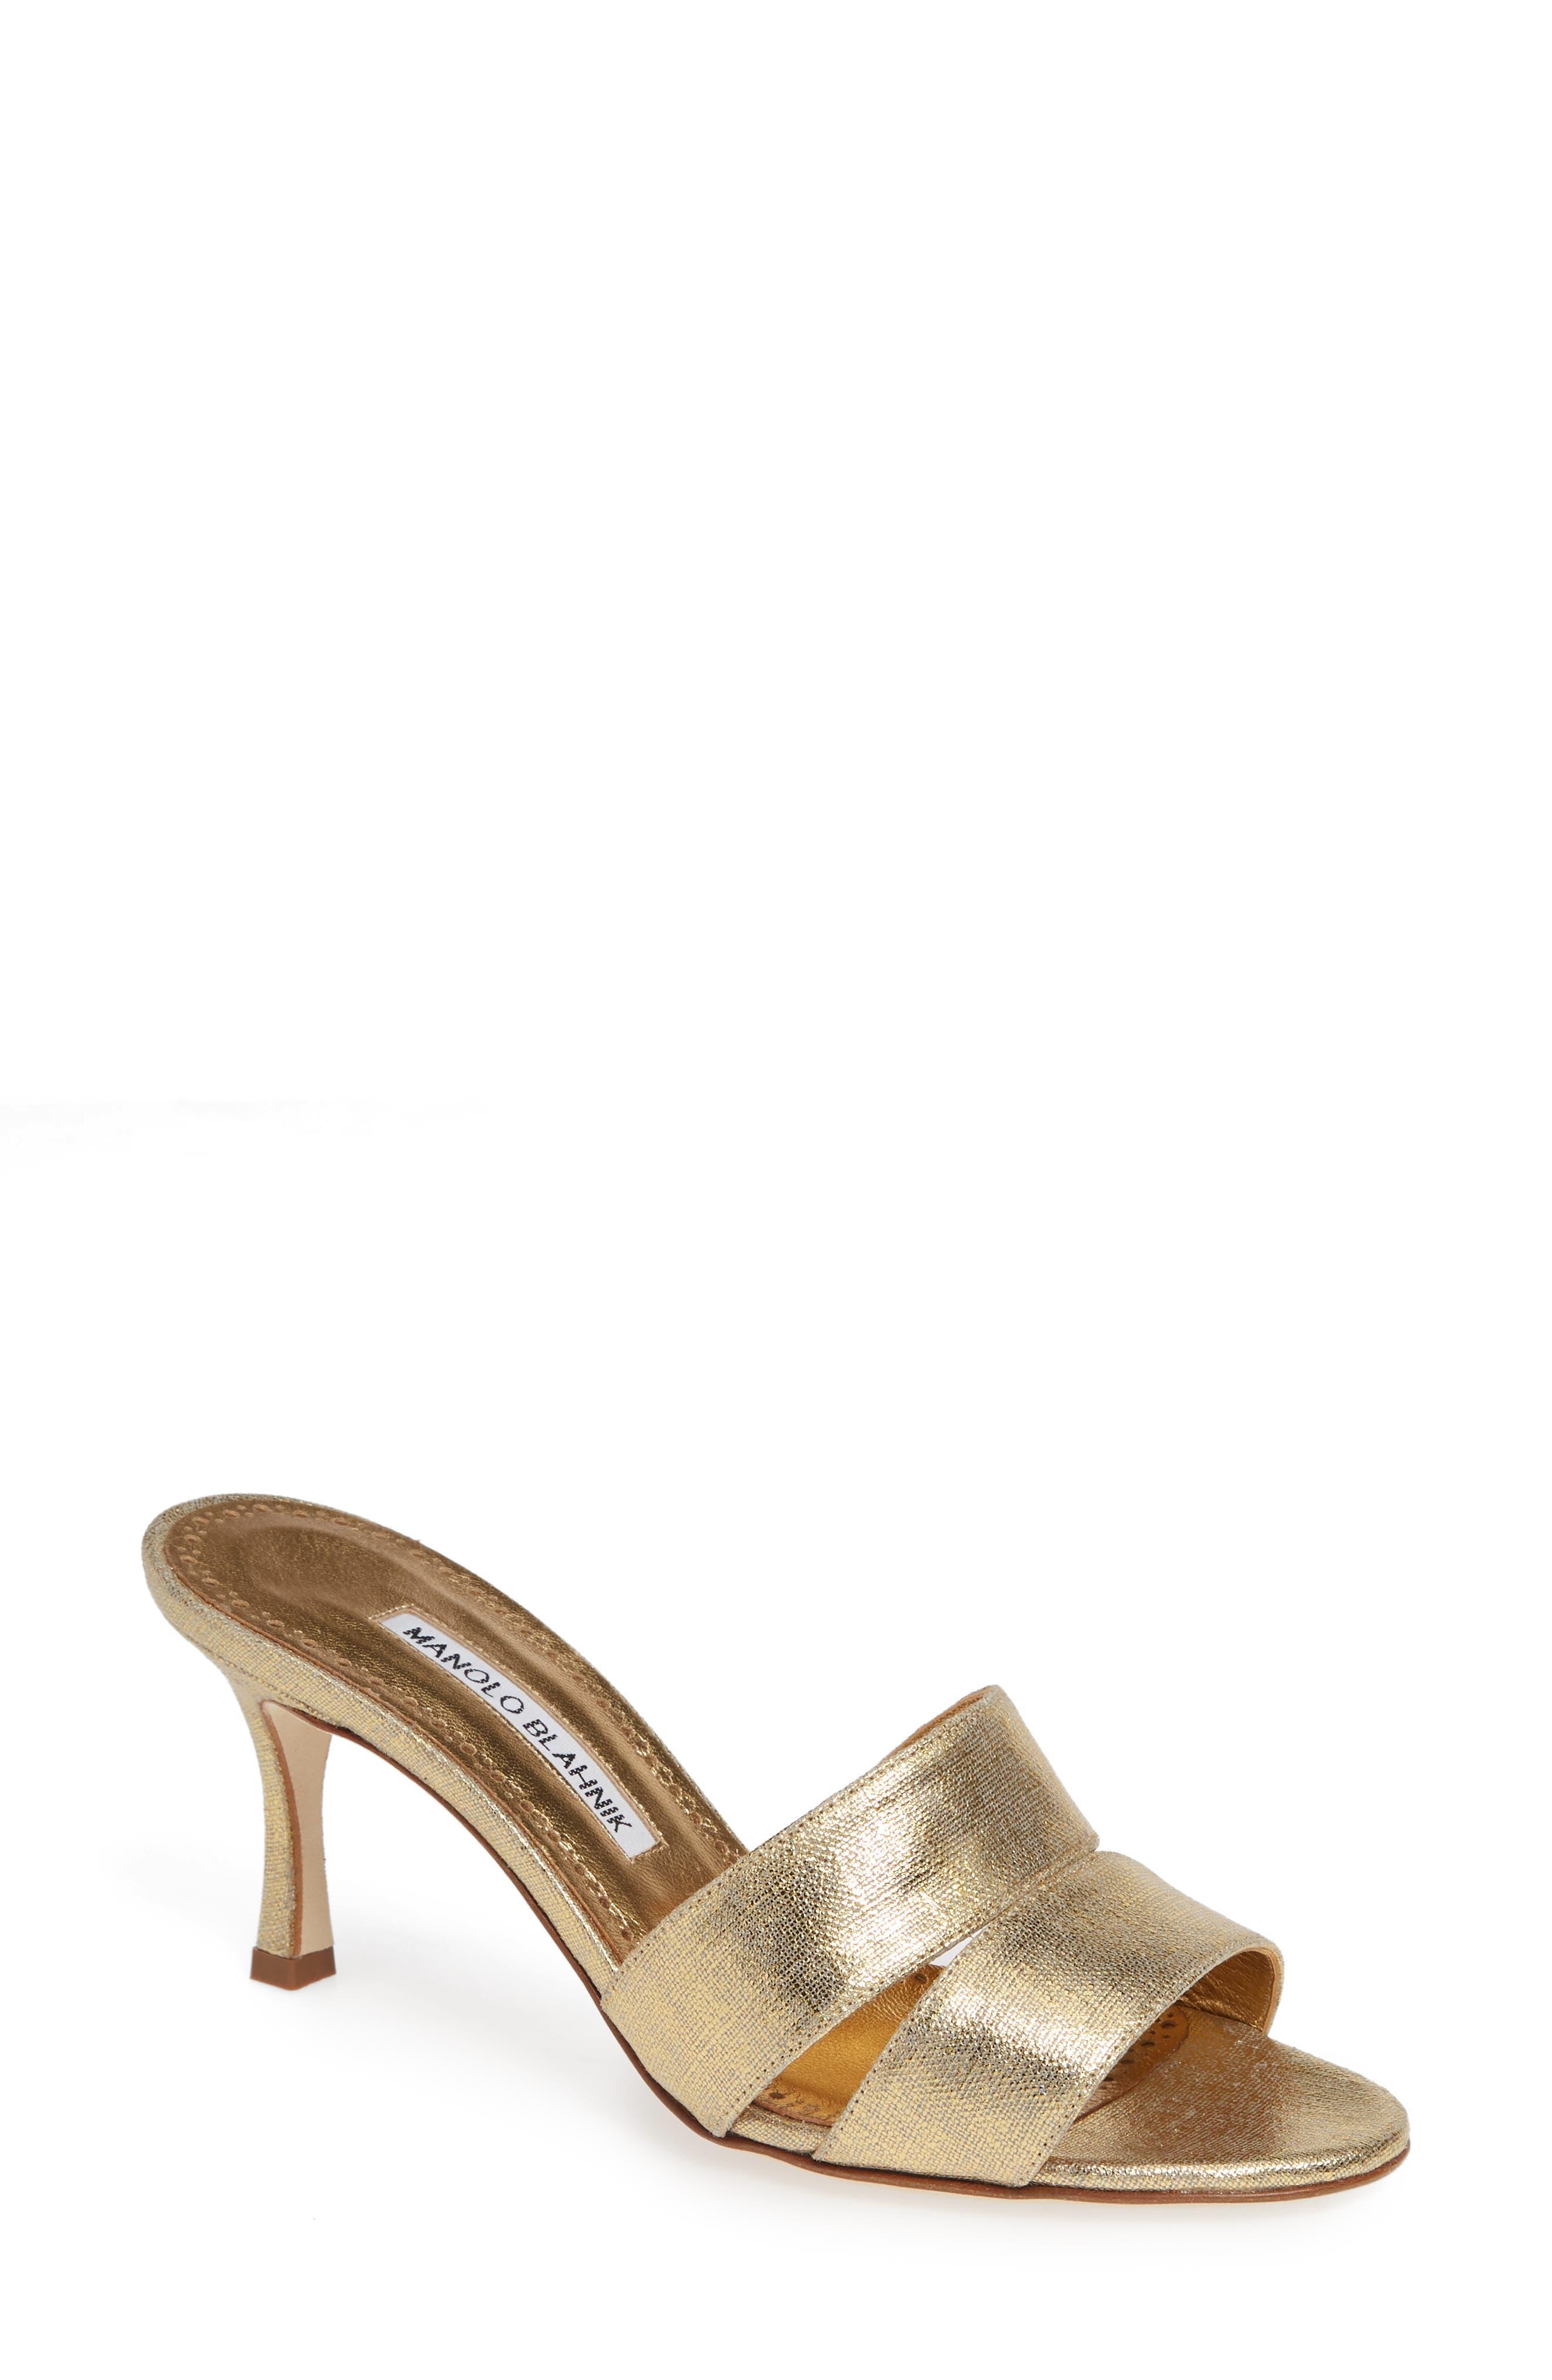 Iacopo Mule Sandal,                         Main,                         color,